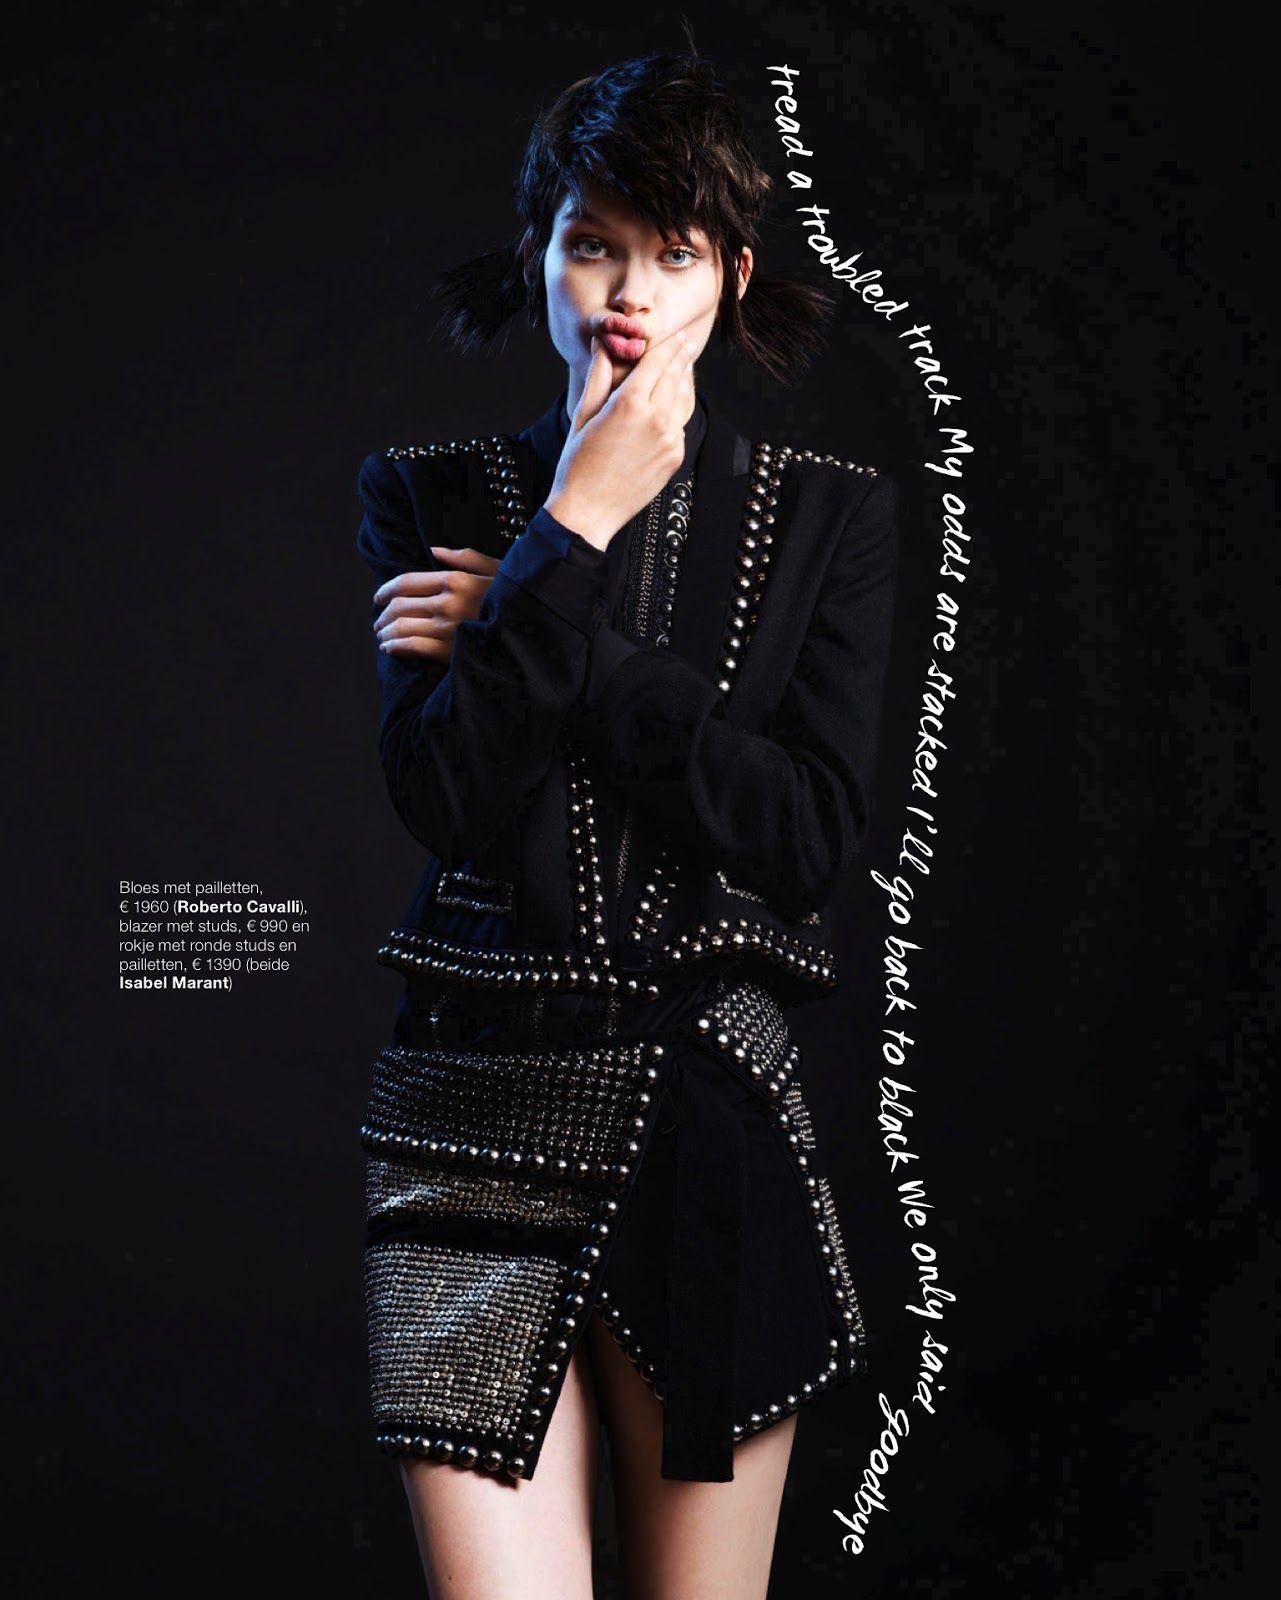 visual optimism; fashion editorials, shows, campaigns & more!: het nieuwe zwart: benthe de vries by klaas jan kliphuis for marie claire netherlands september 2013